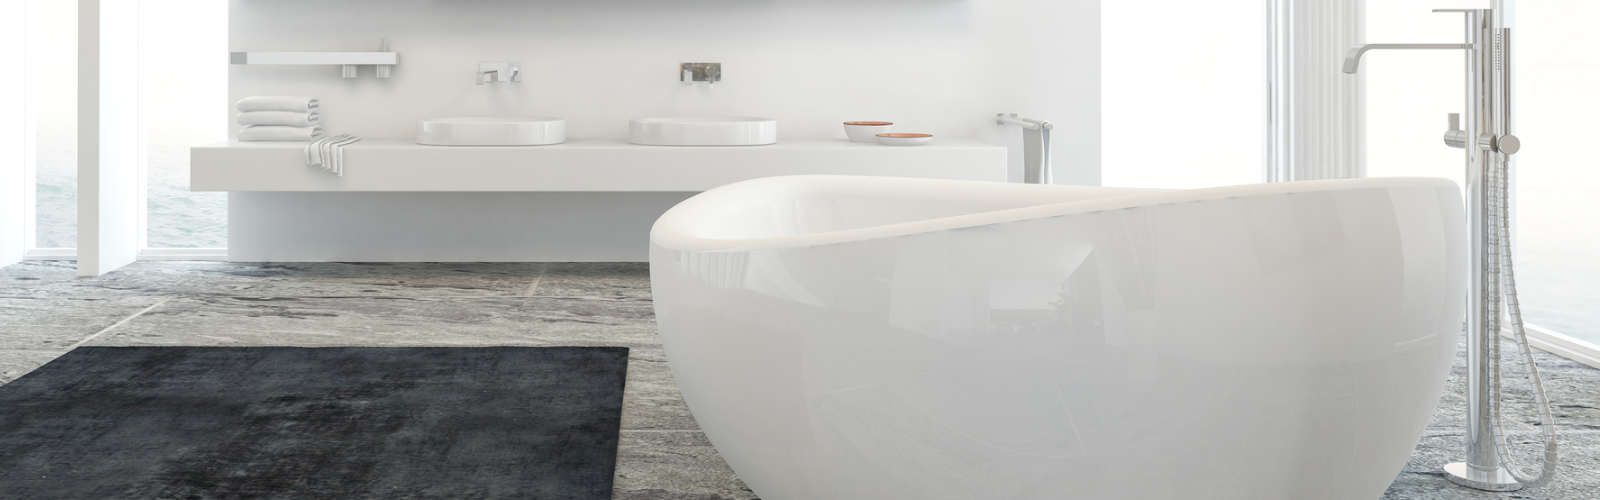 Bathroom Design Hampshire